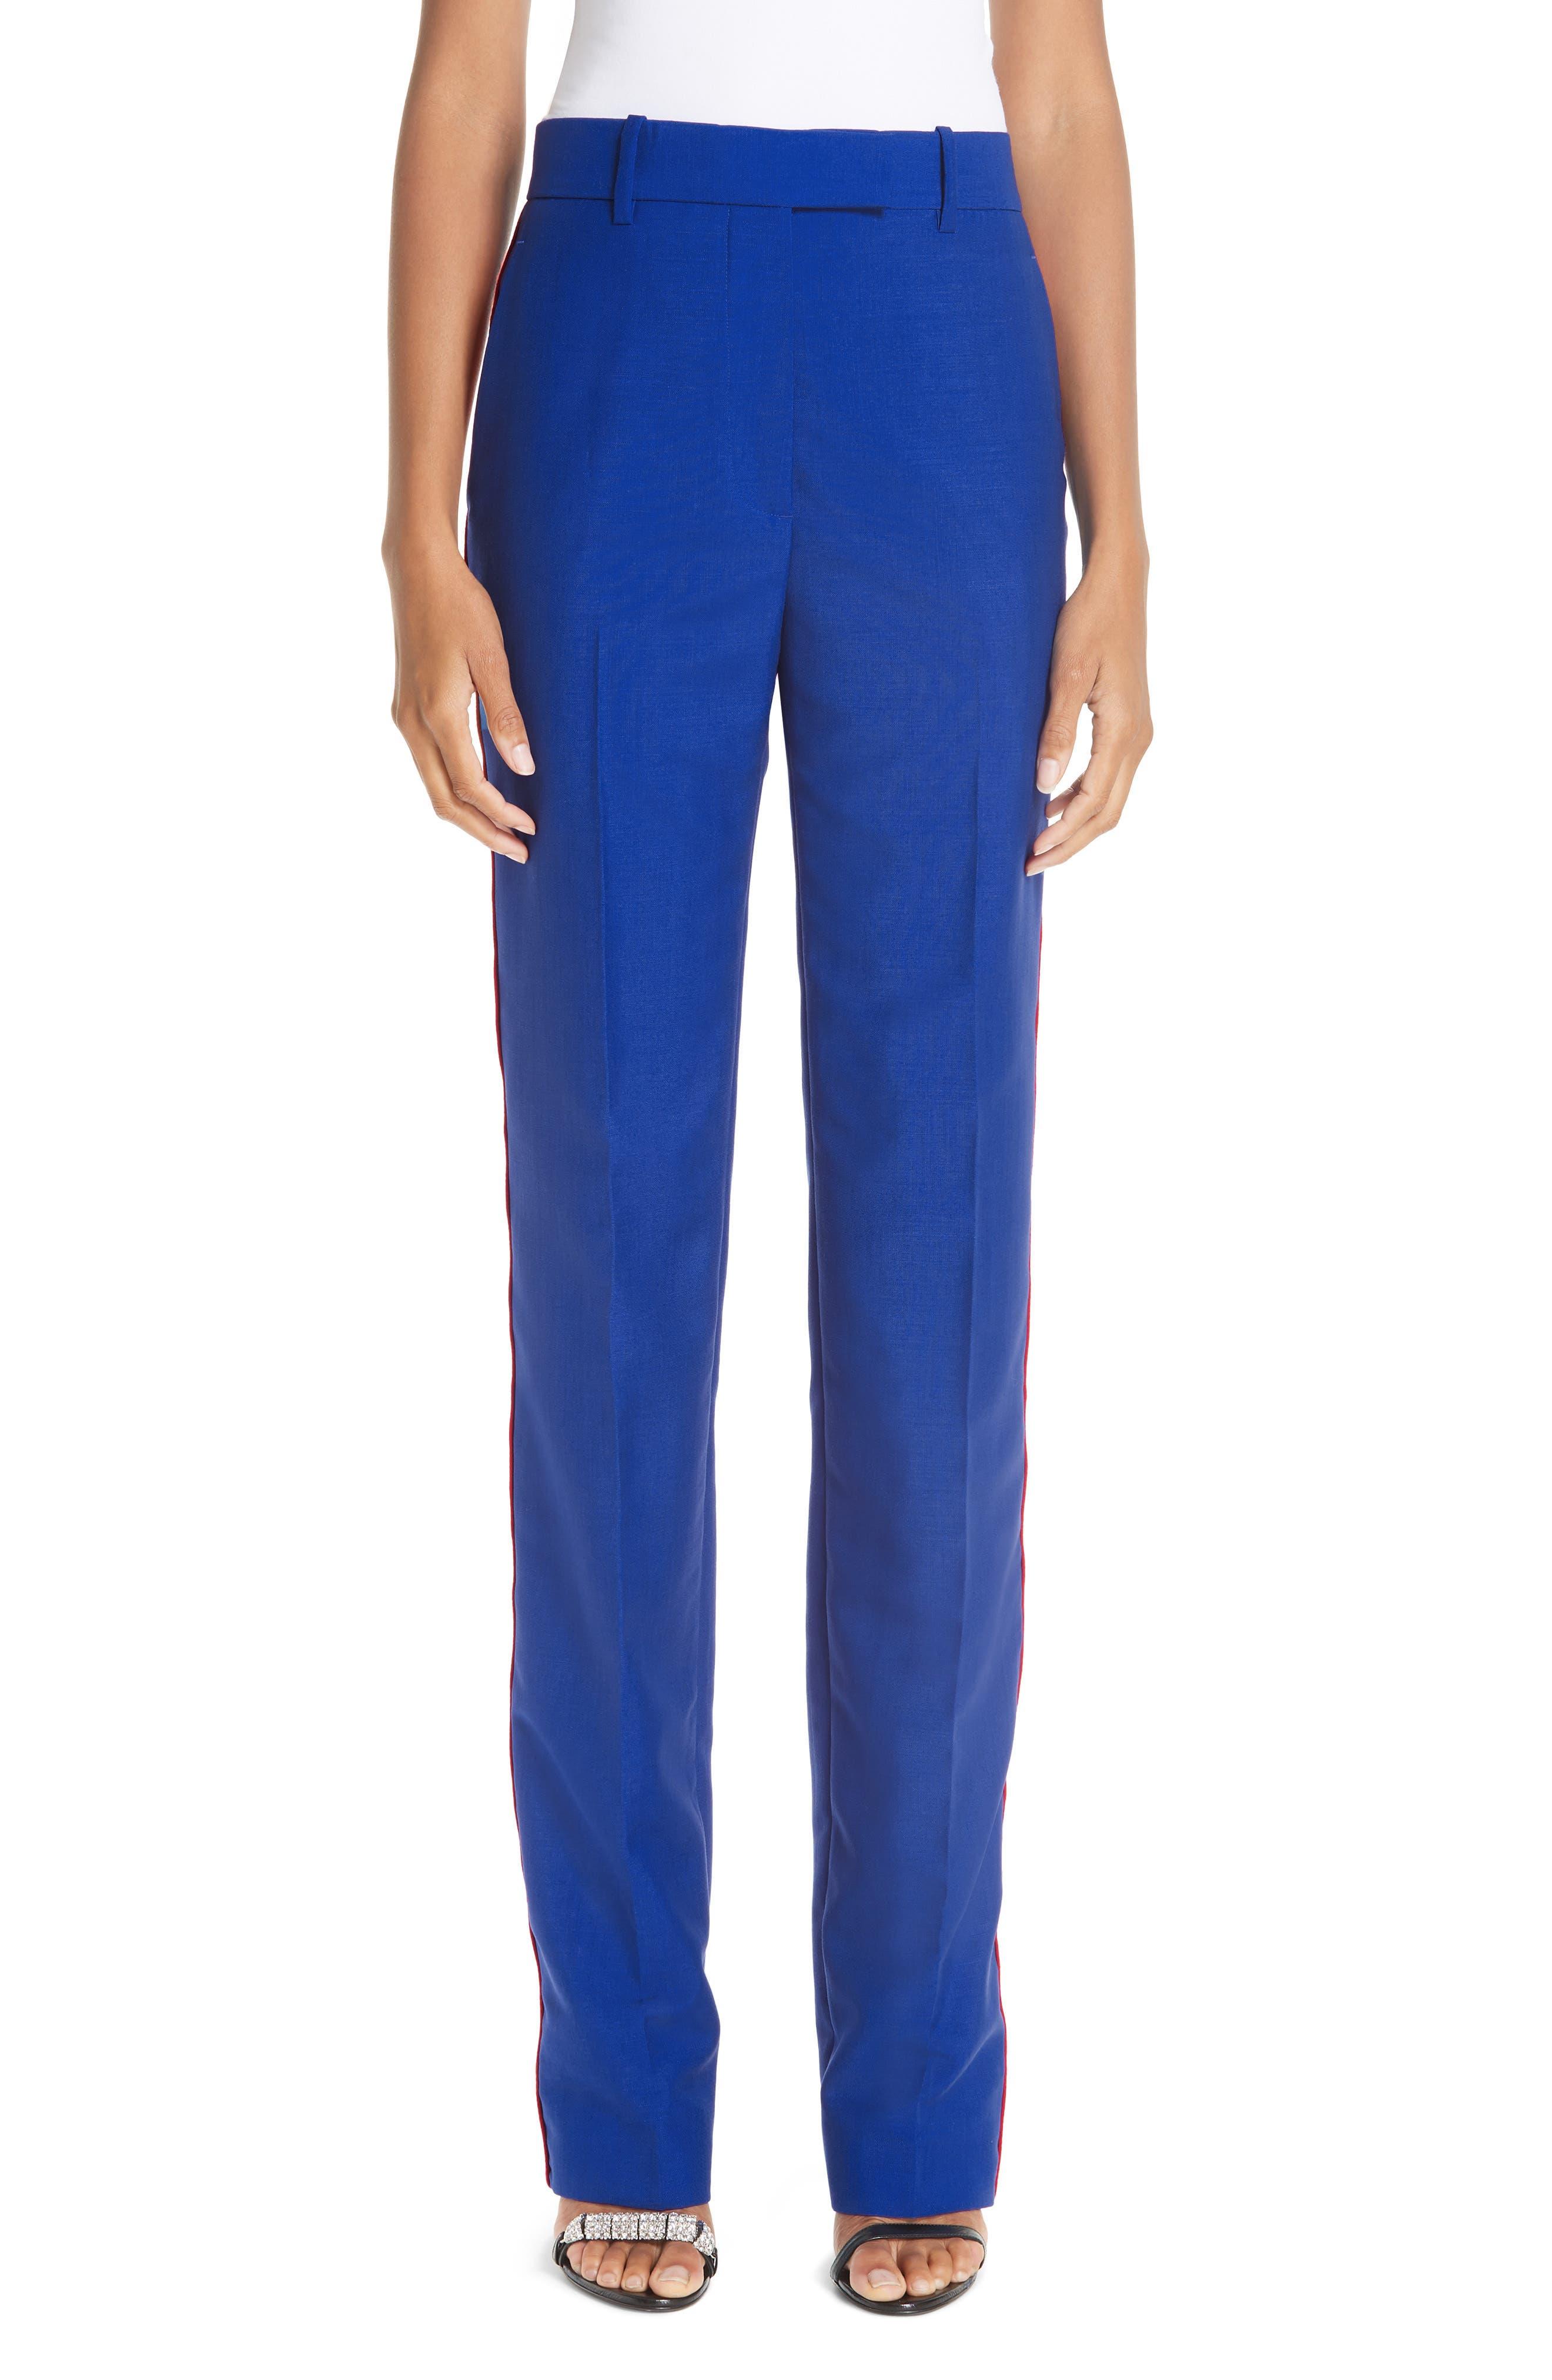 CALVIN KLEIN 205W39NYC Side Stripe Mohair & Wool Straight Leg Pants, Main, color, BRIGHT BLUE